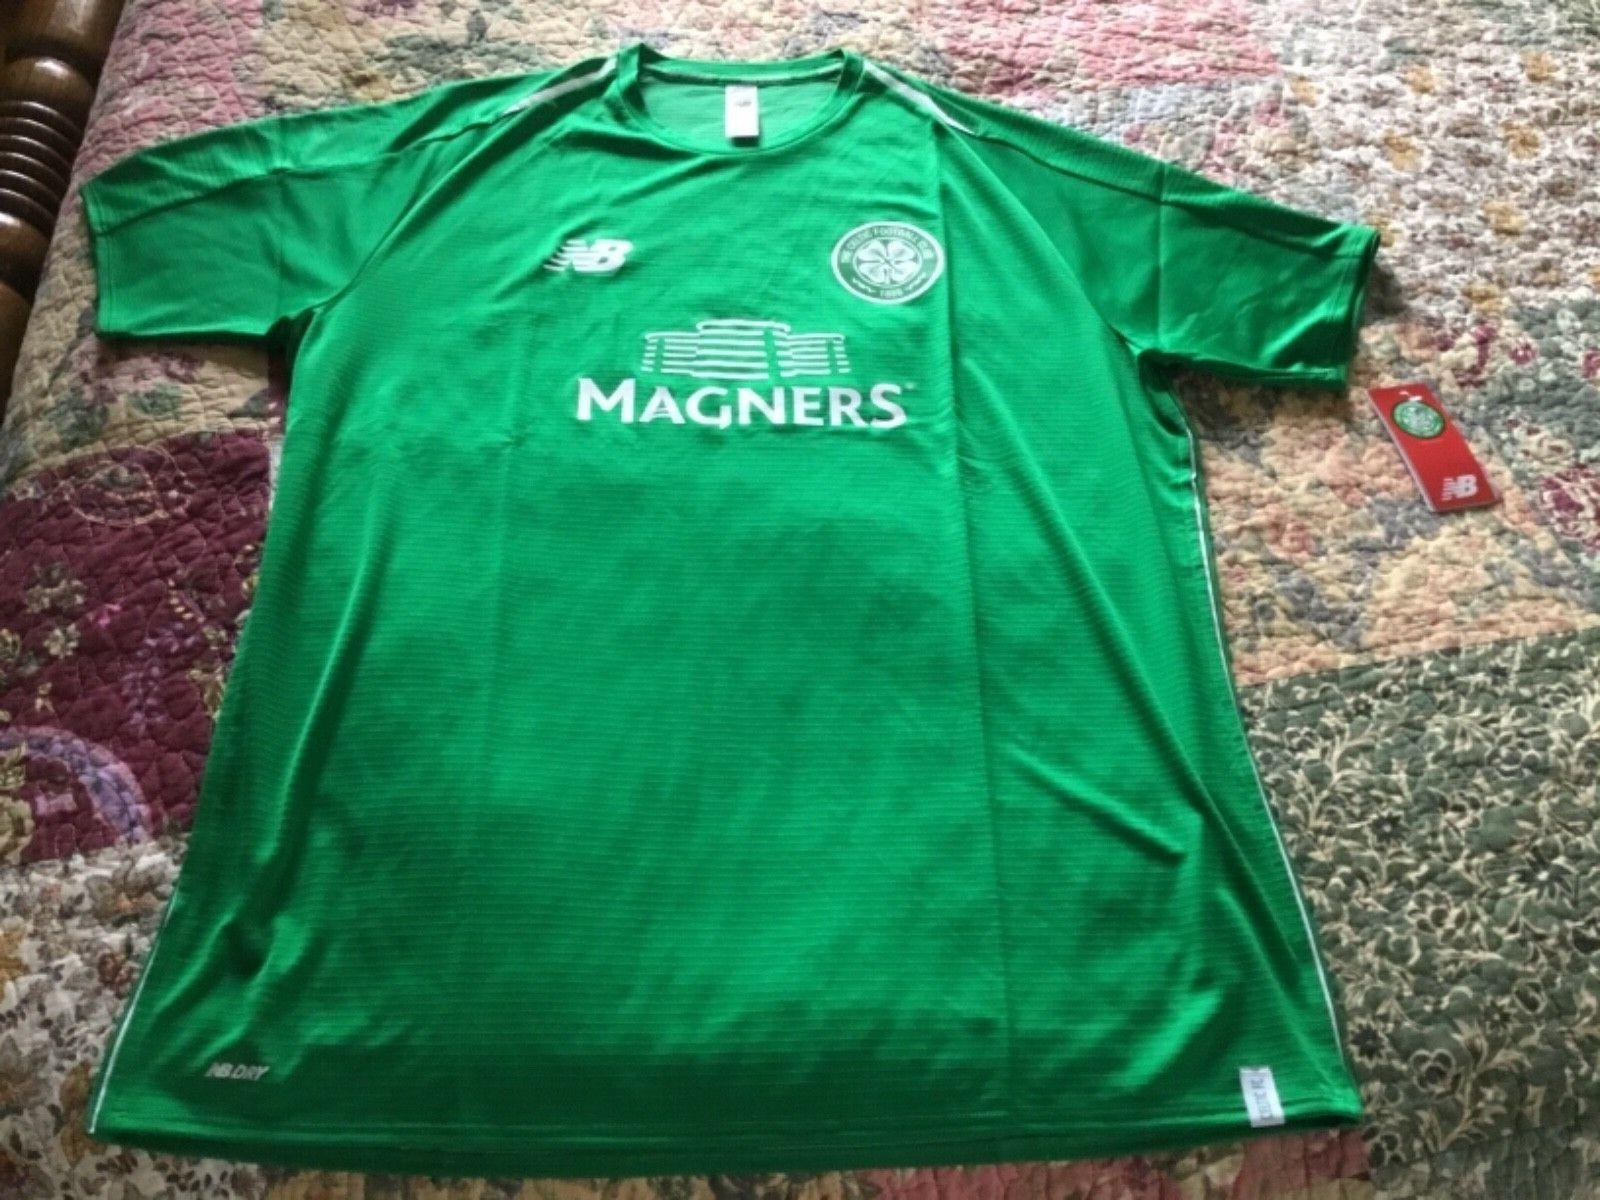 Lot of 2 Celtic F.C soccer jerseys,home training NWT,XL,By New Balance Scotland